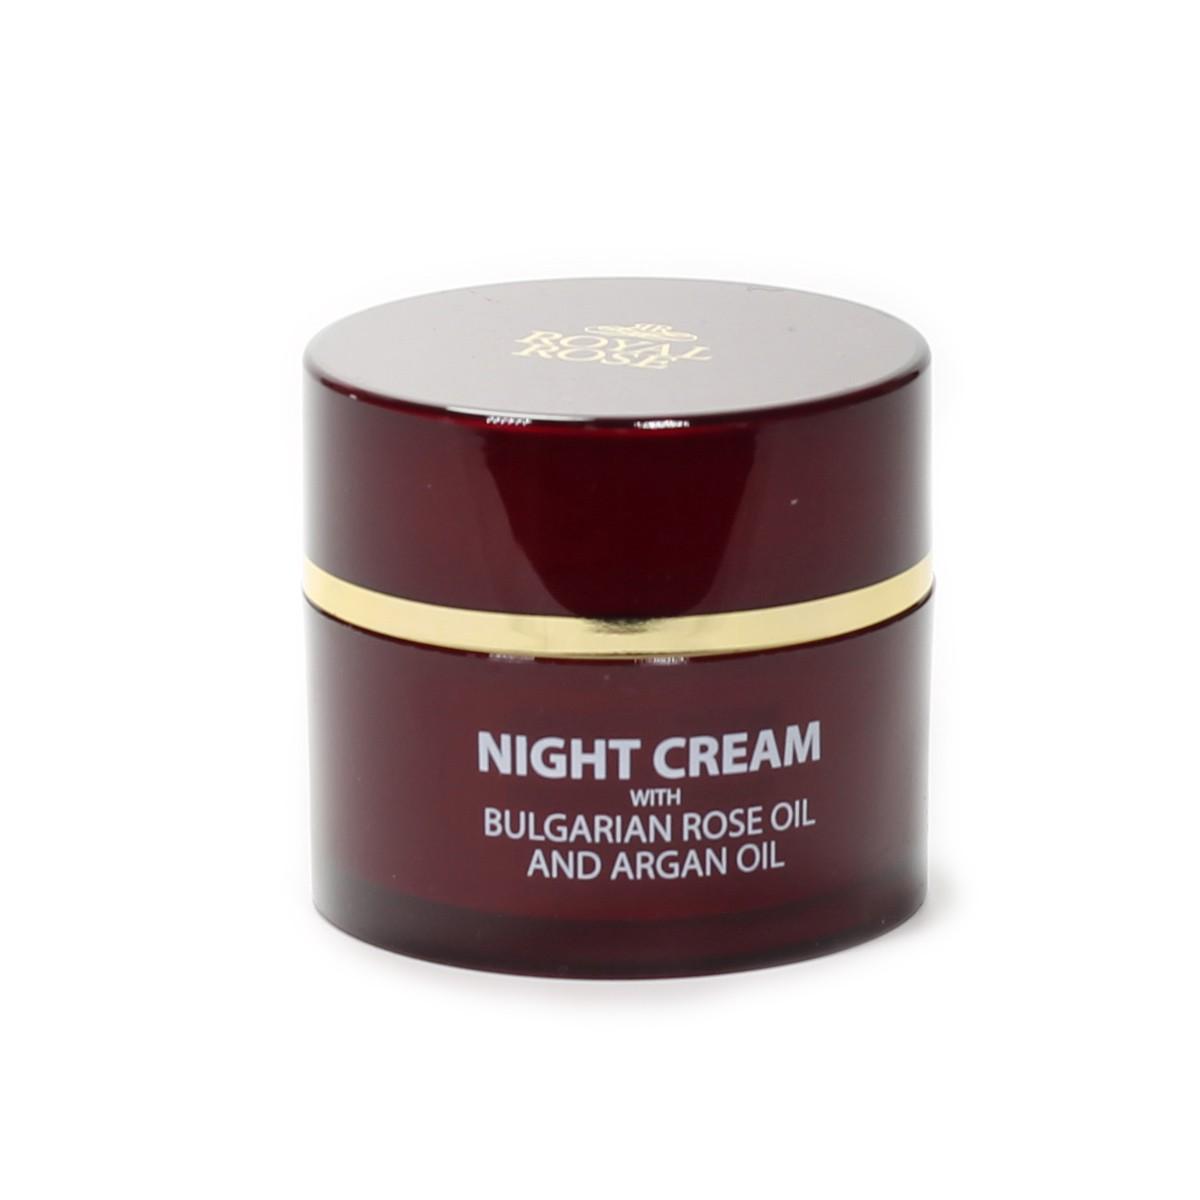 Night cream with Bulgarian rose oil Royal Rose Biofresh